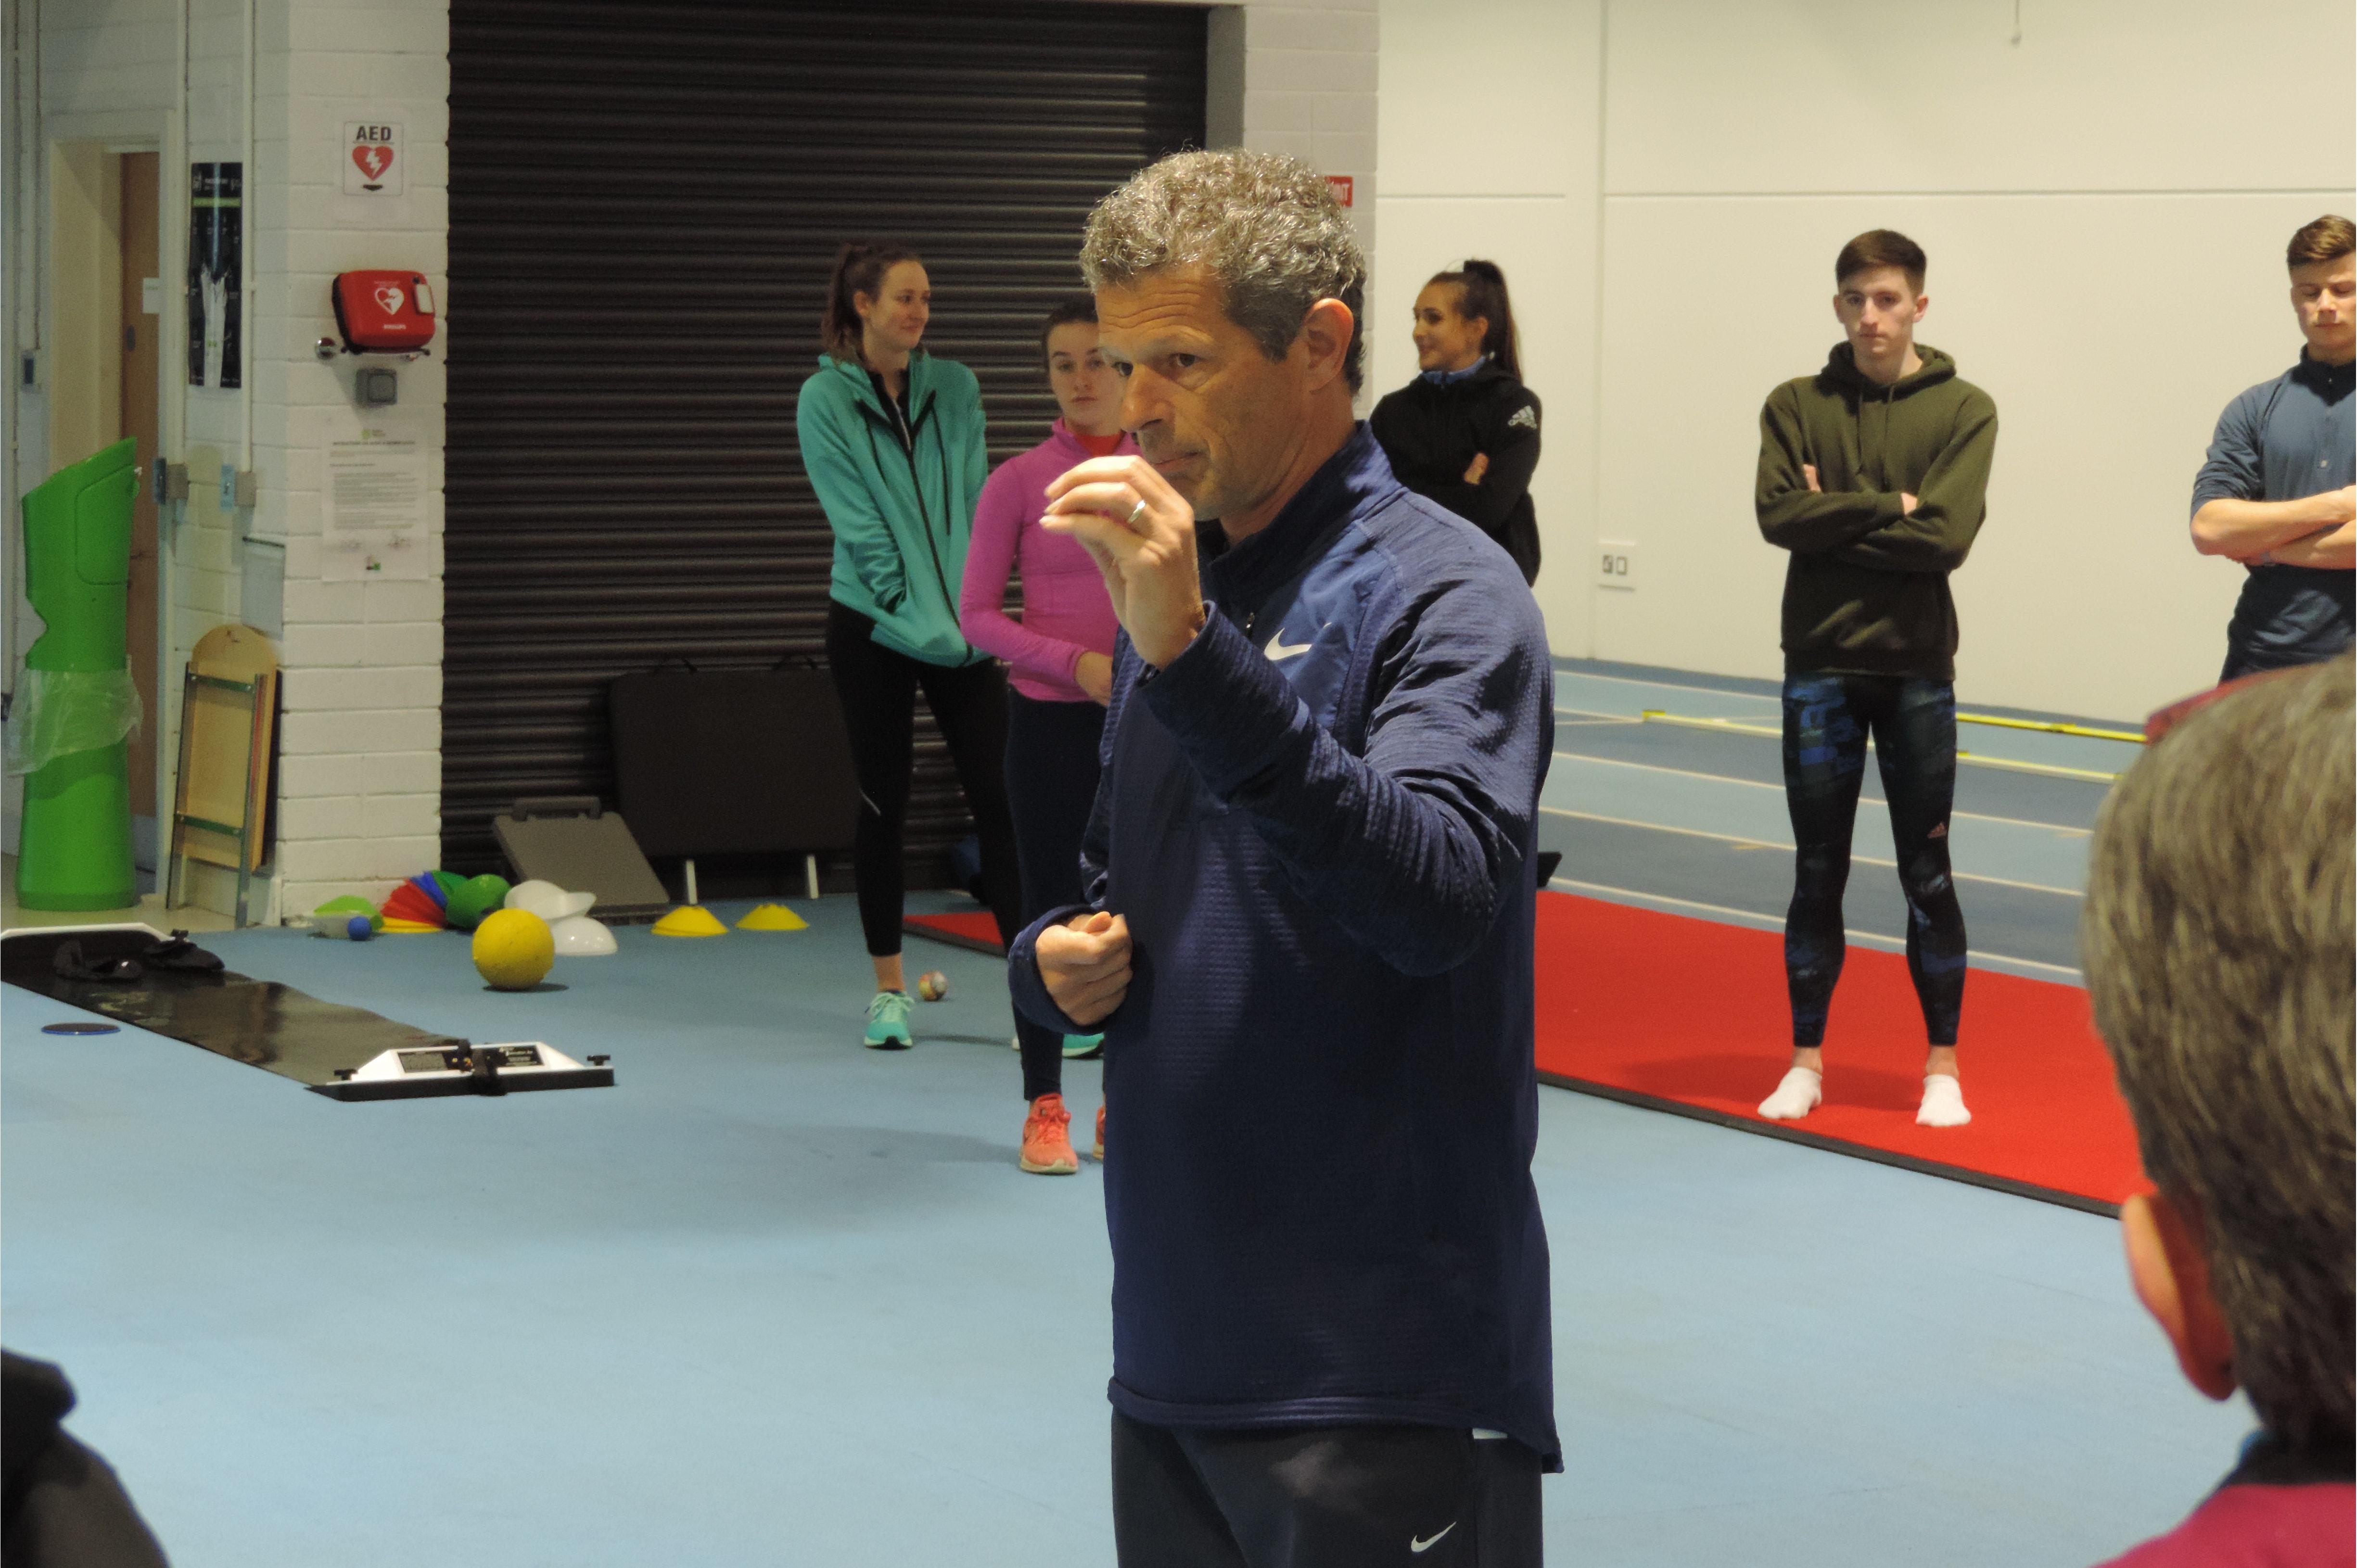 Coach Borlee Encourages Irish Sprints Coaches to Believe in Magic